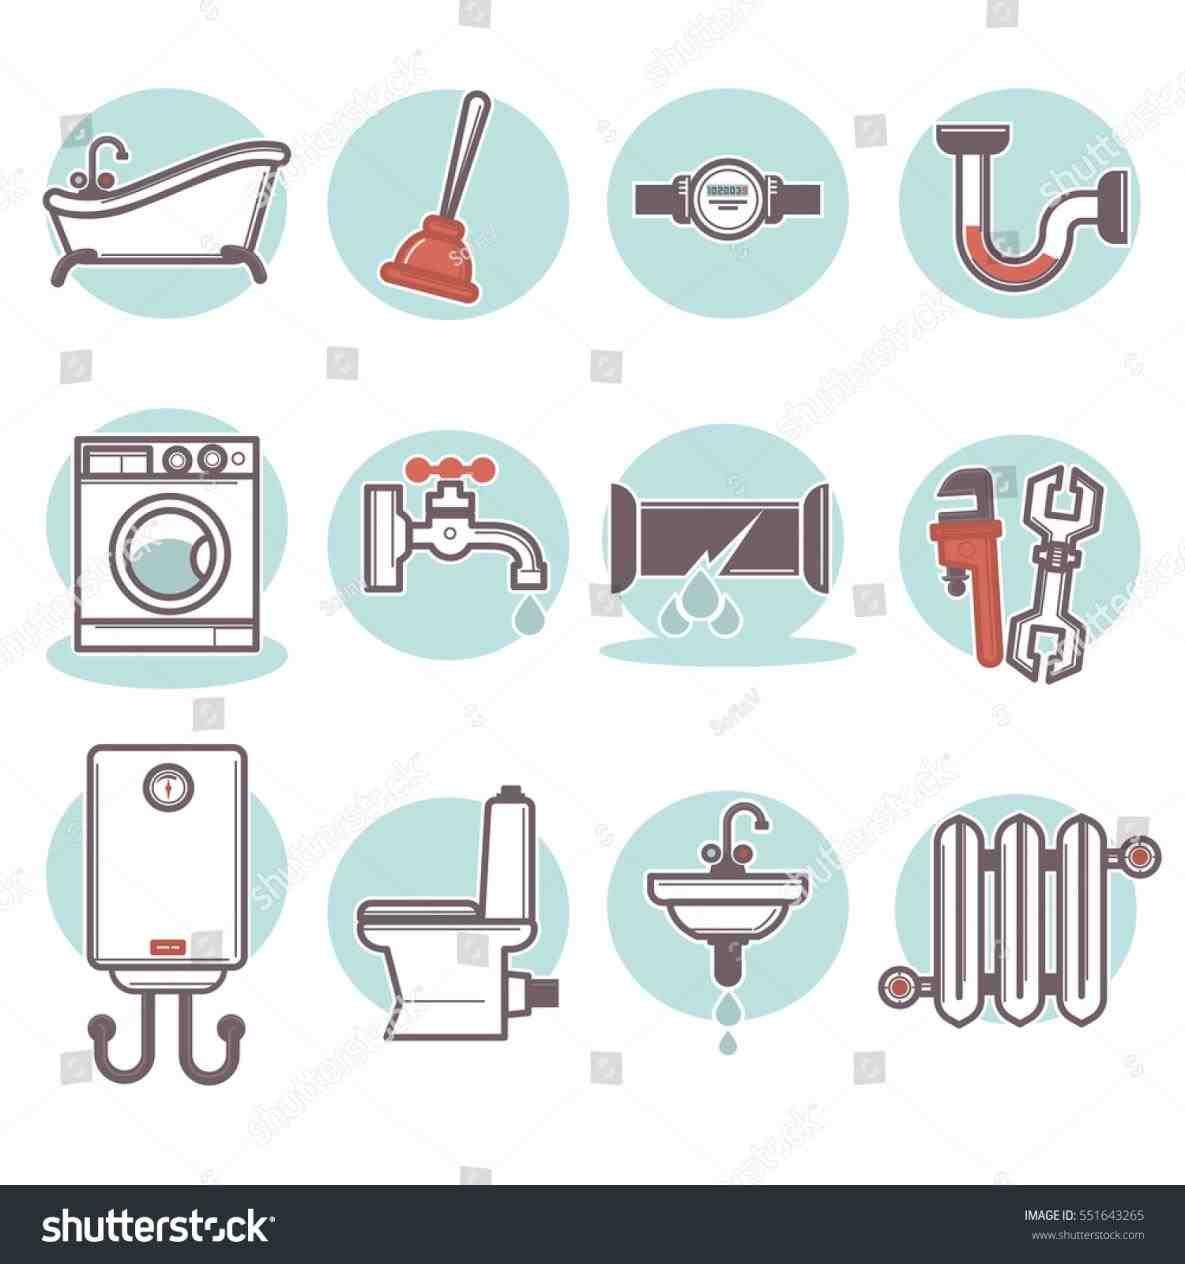 New clean bathroom sink clipart at xx16.info | Home Designs ... for Clean Bathroom Sink Clipart  83fiz